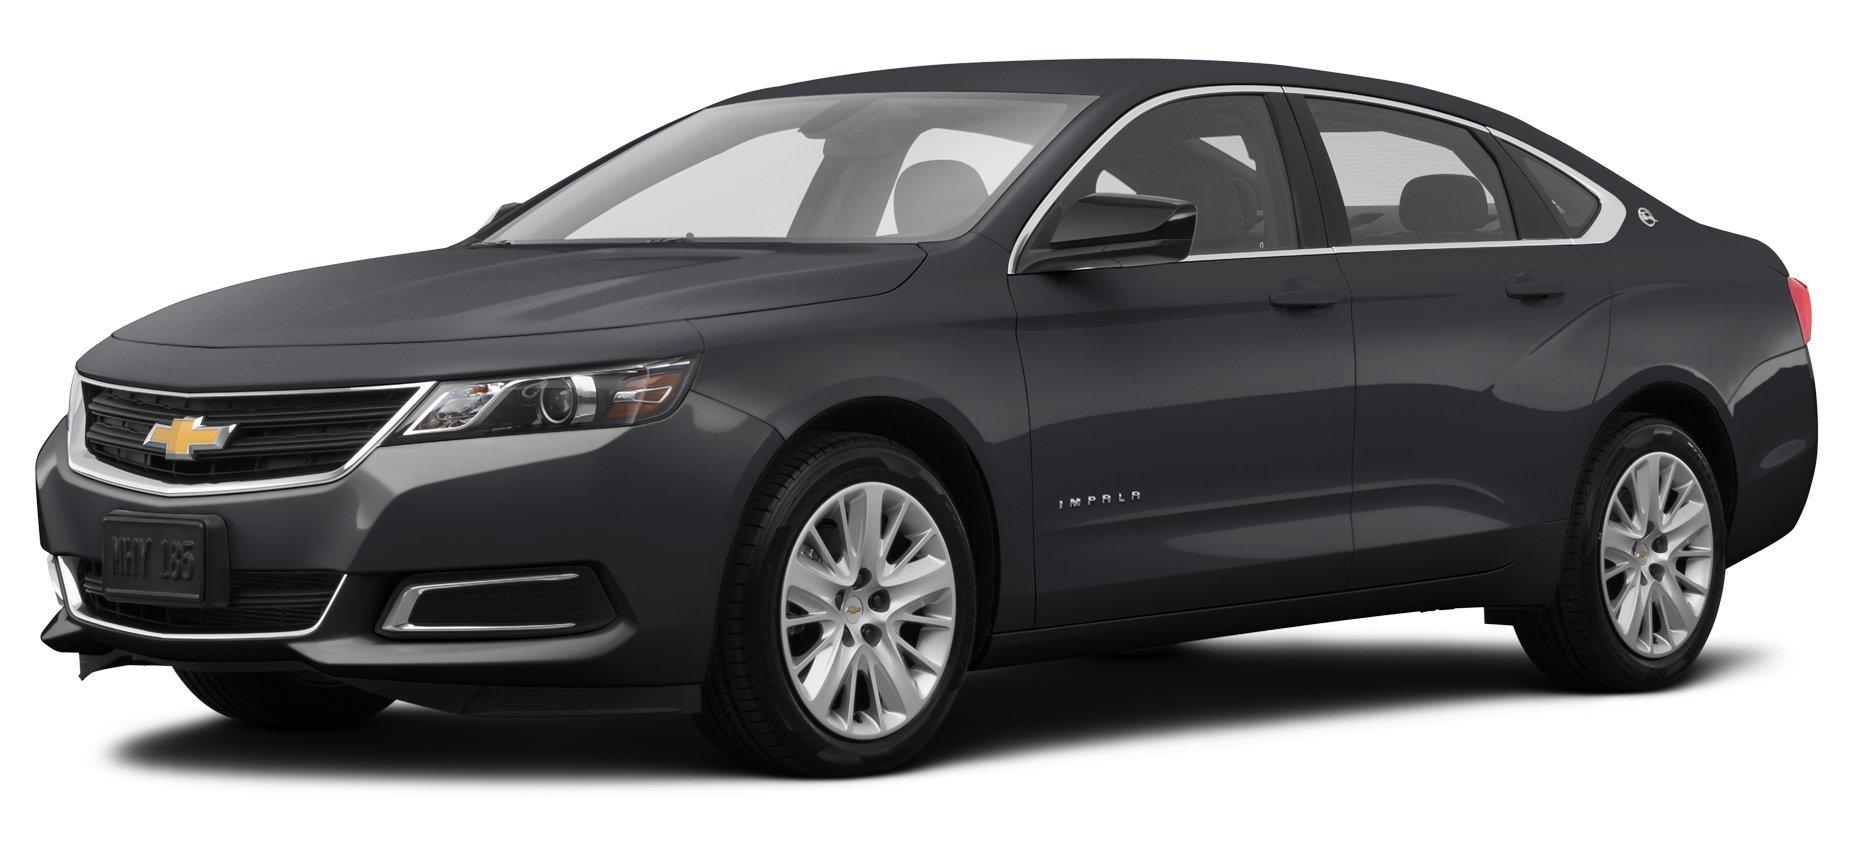 Impala 2015 chevrolet impala : Amazon.com: 2015 Chevrolet Impala Reviews, Images, and Specs: Vehicles